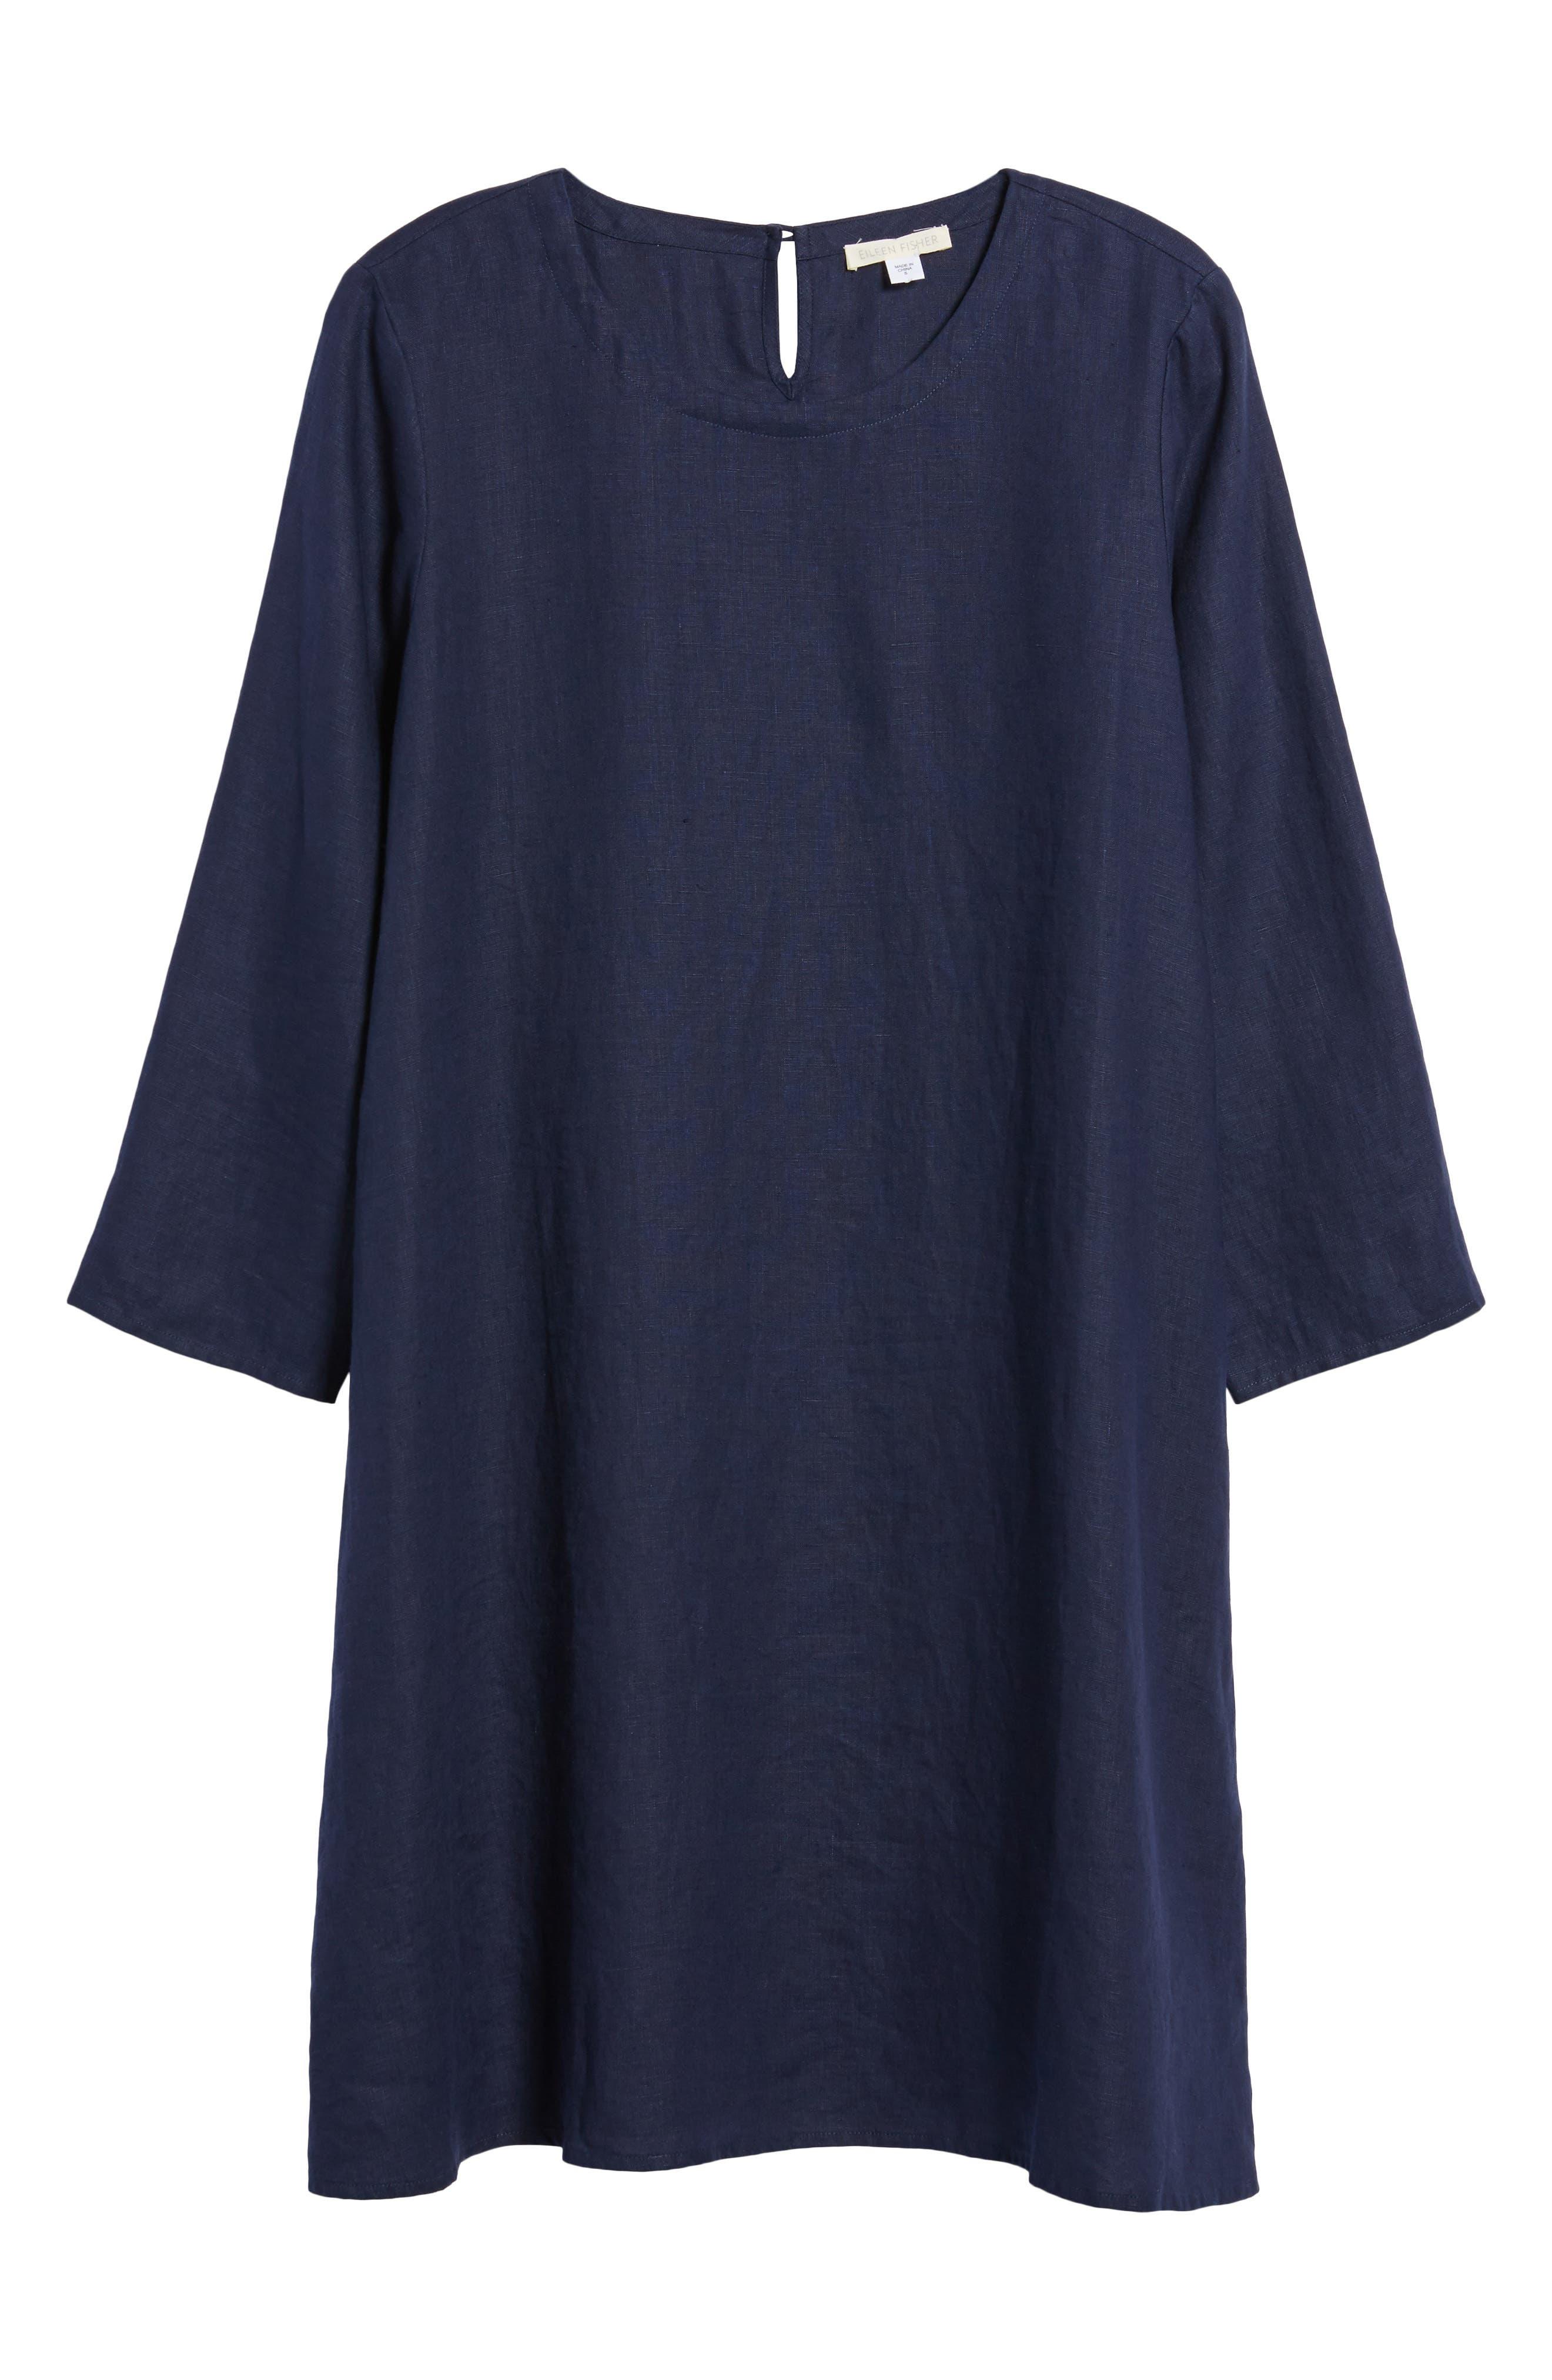 Organic Linen Round Neck Shift Dress,                             Alternate thumbnail 6, color,                             419